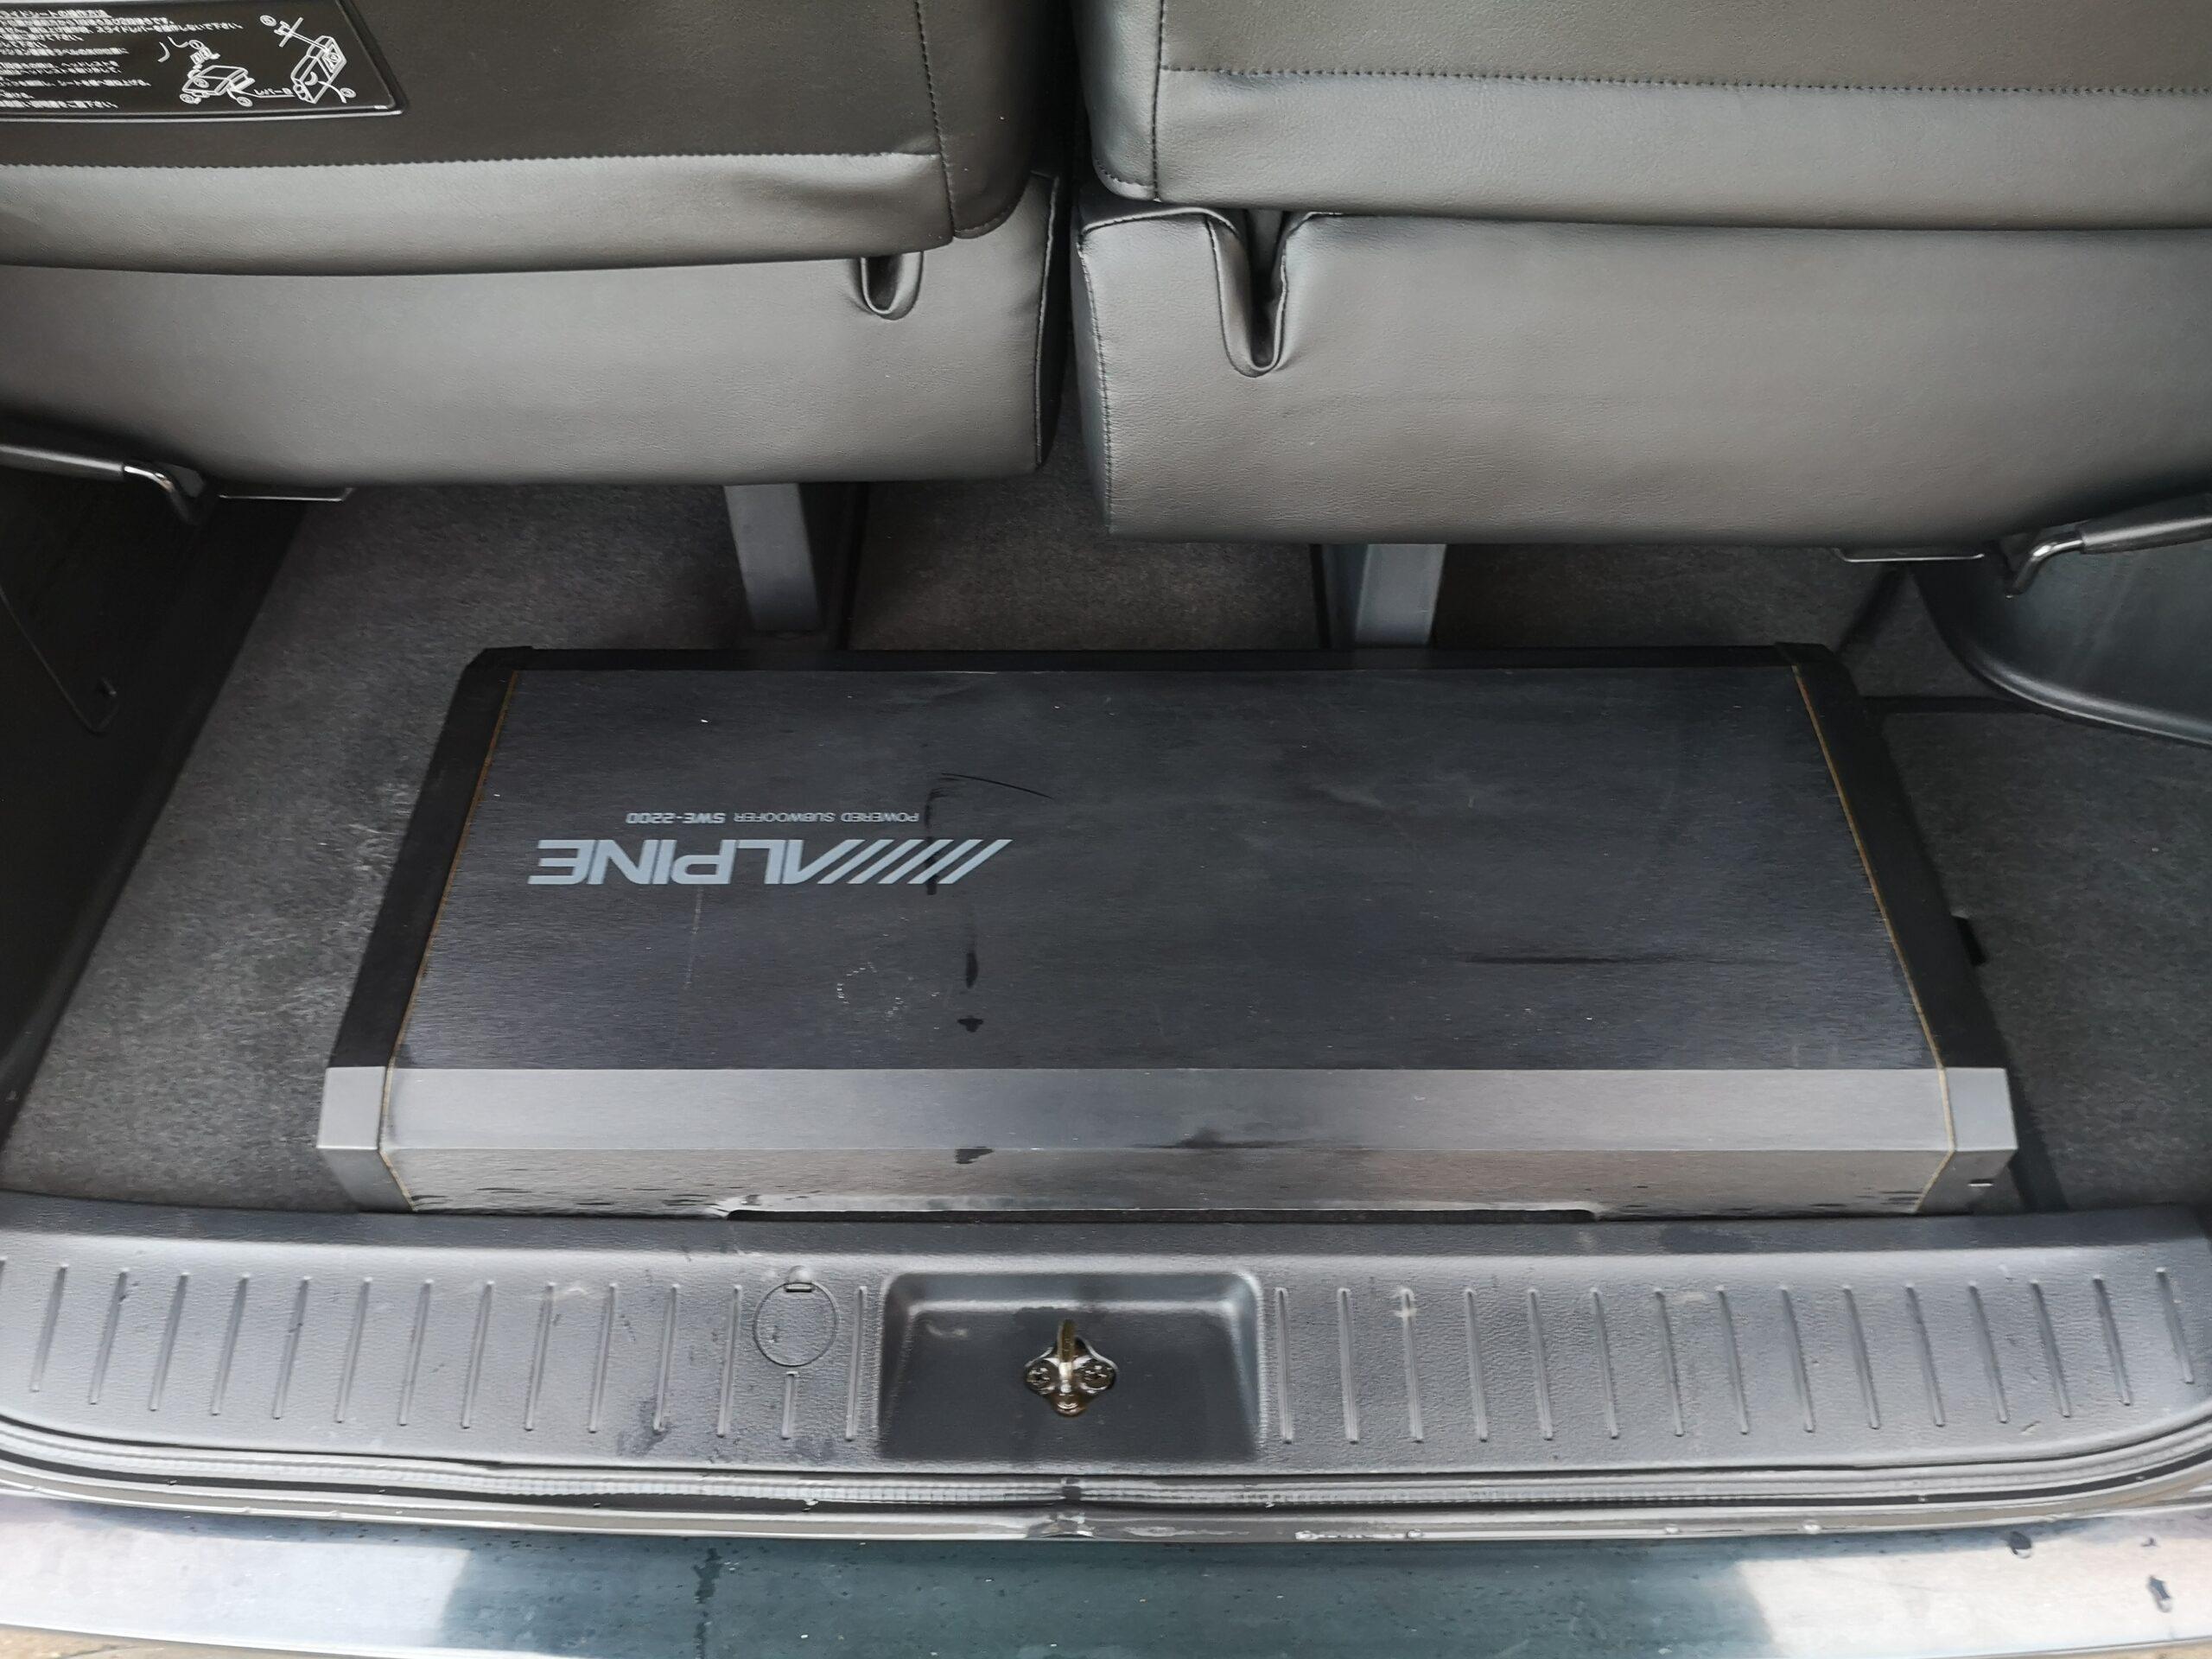 NISSAN ELGRAND HIGHWAY STAR 3.5 V6 2006 BIMTA WARRANTED LOW MILEAGE